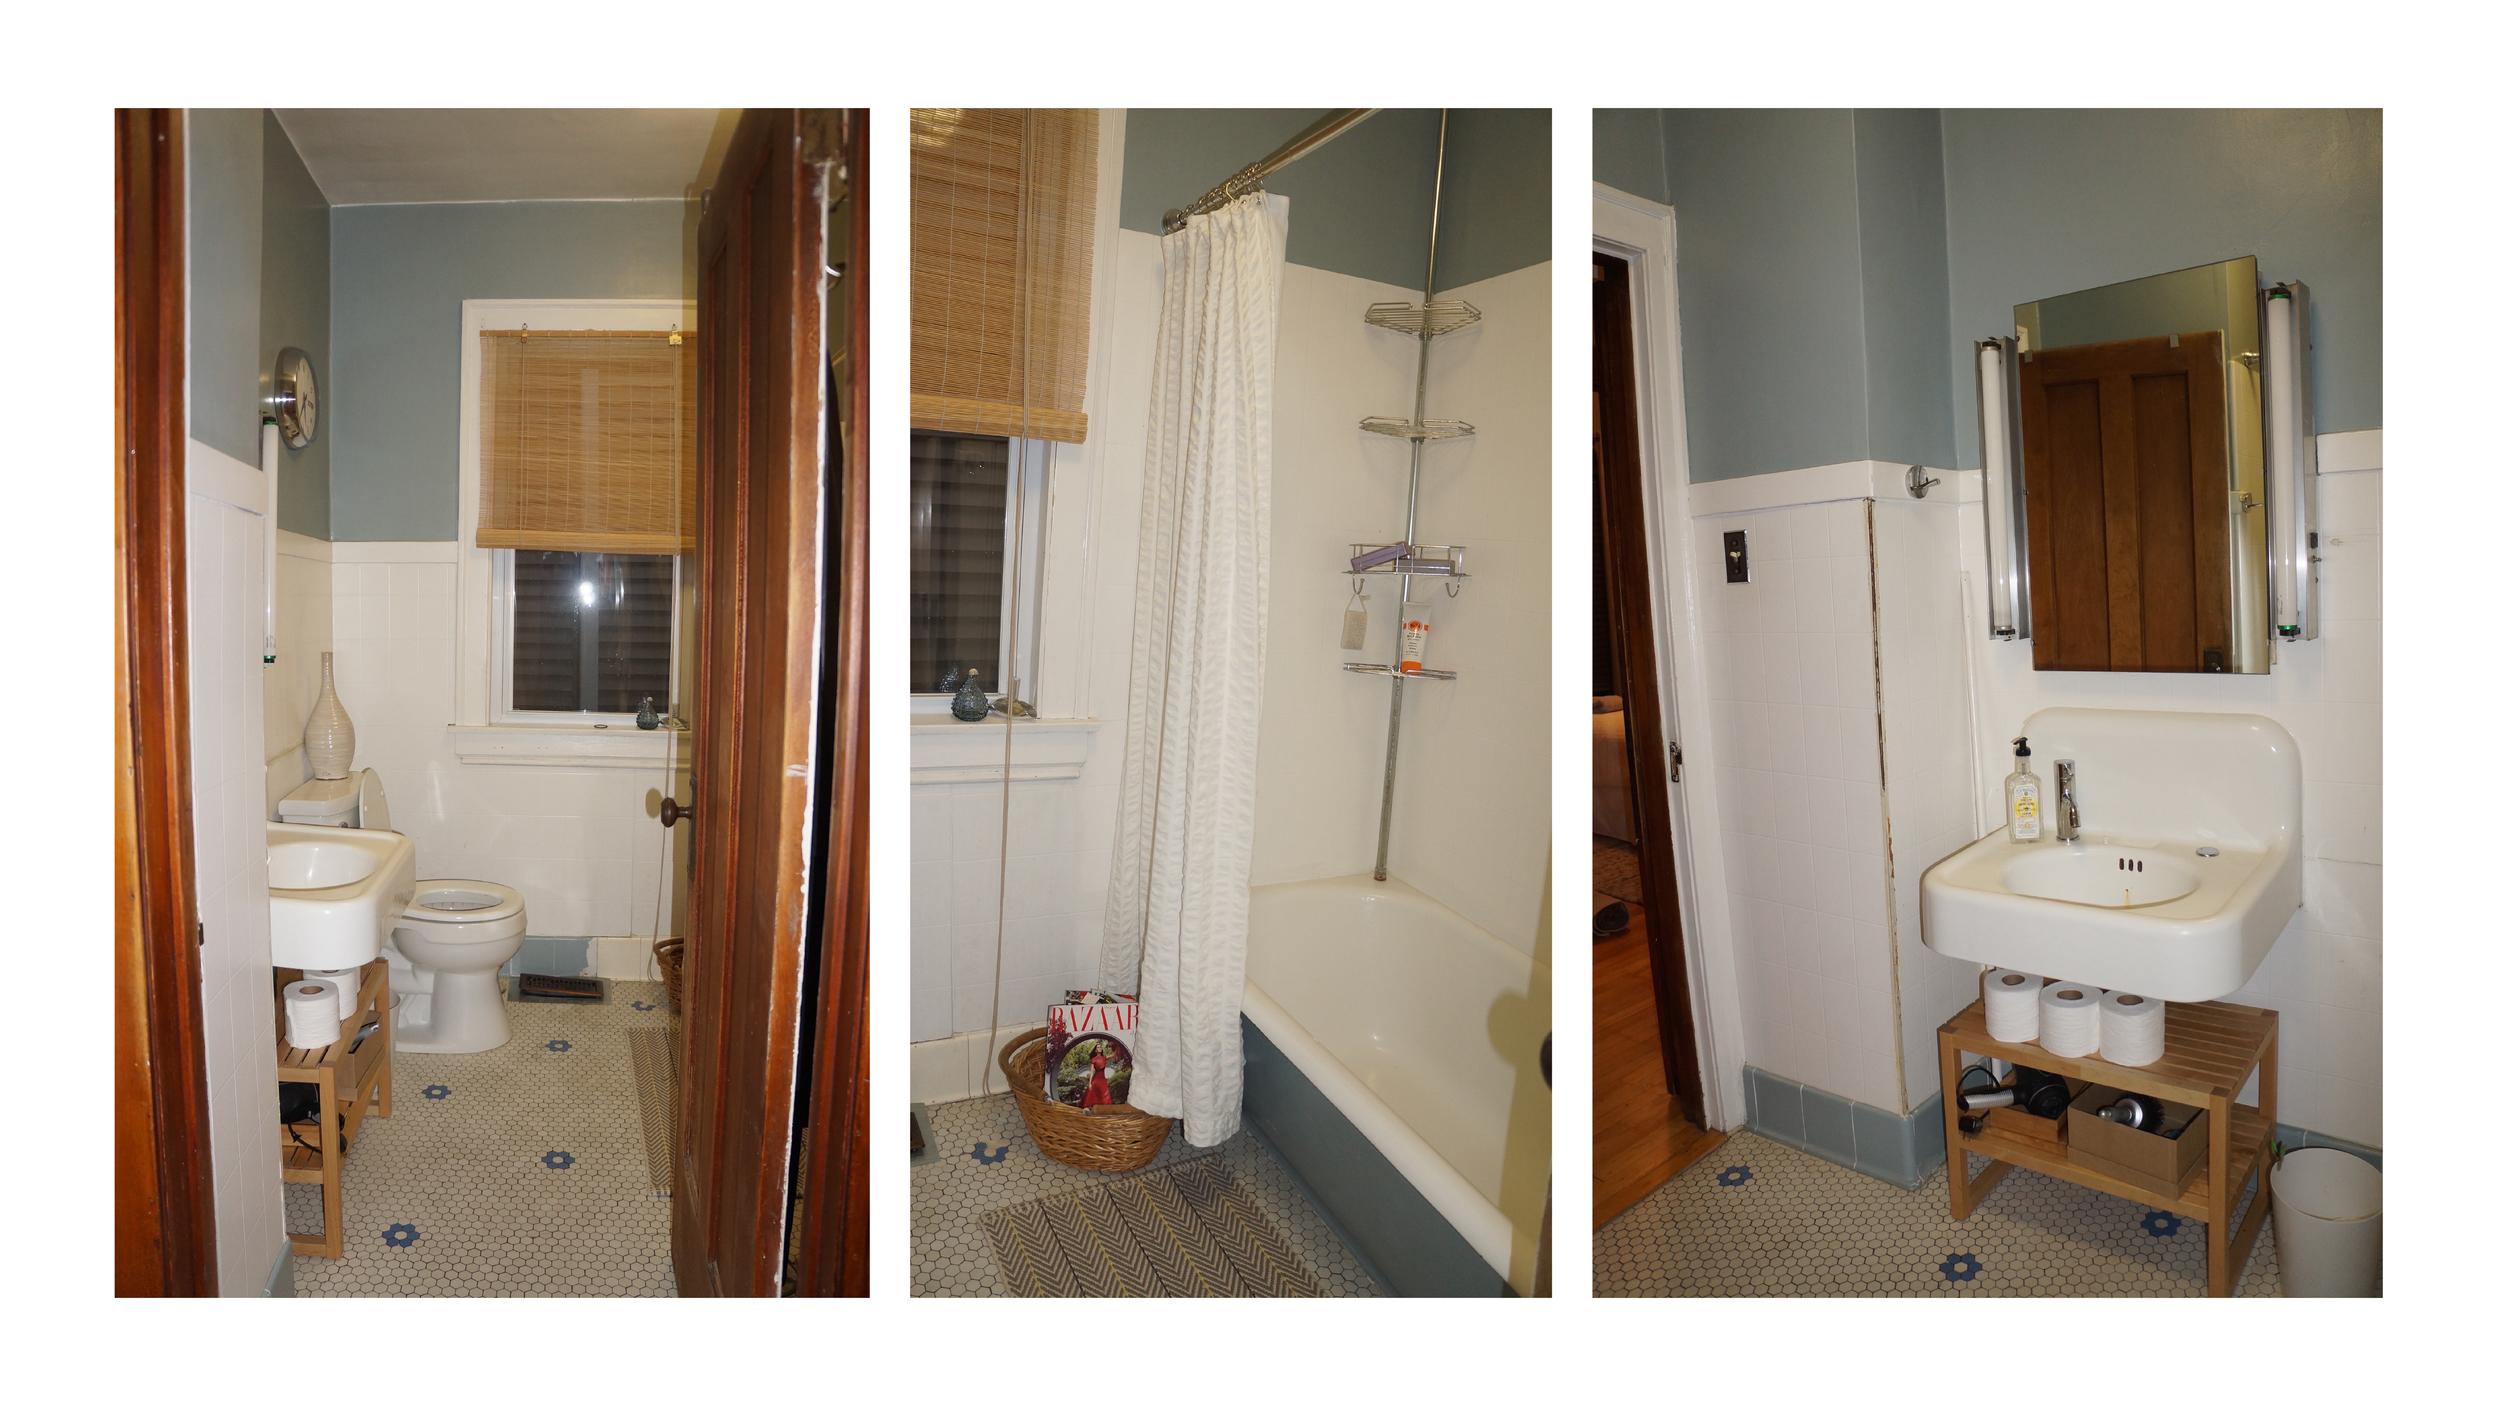 Rockwell_Bathroom_Before.jpg